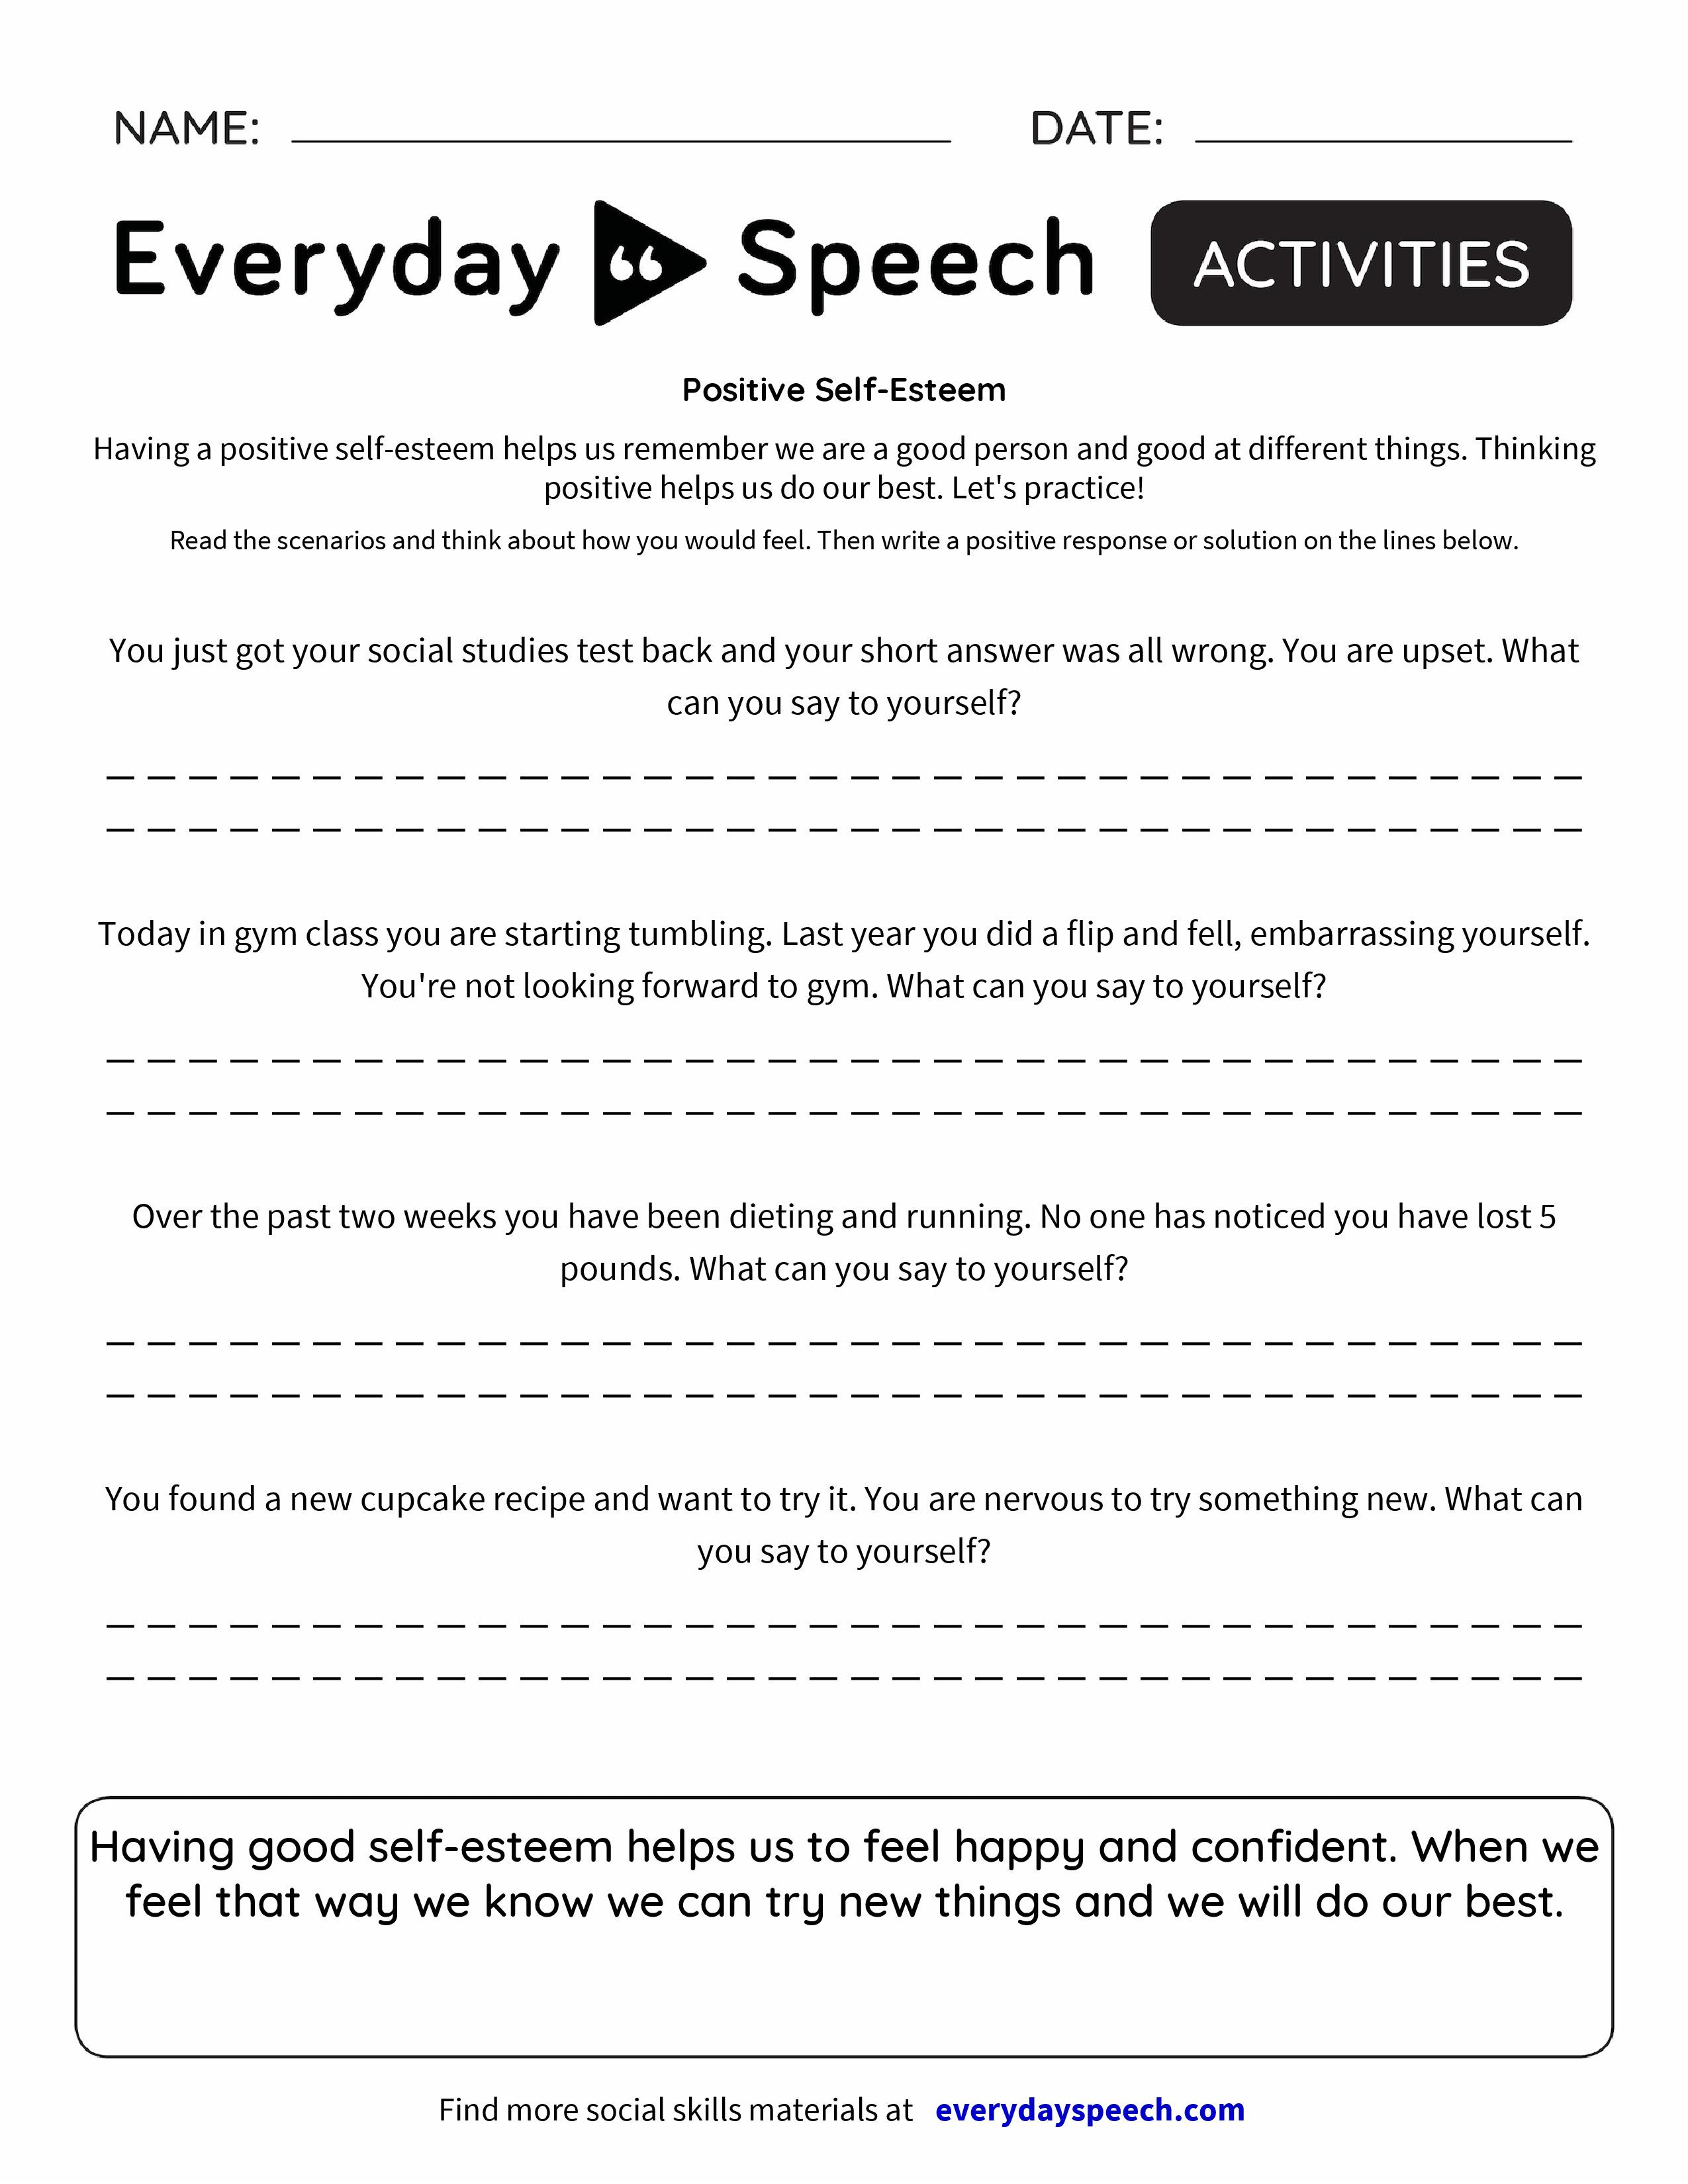 Worksheets Self Esteem Worksheets positive self esteem everyday speech preview preview